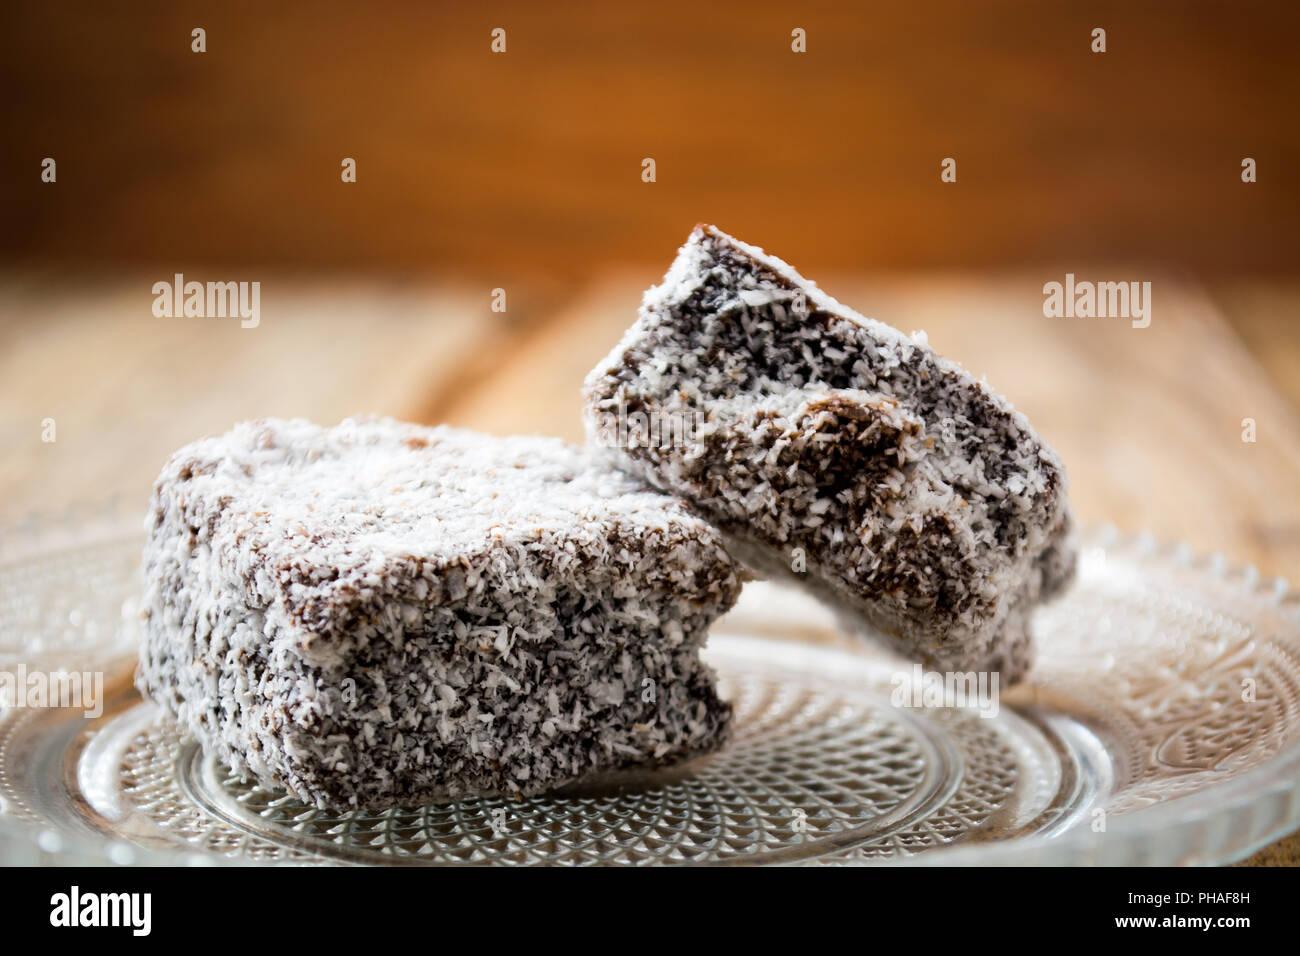 Schokolade Kuchen Mit Kokos Mehl Stockfoto Bild 217205089 Alamy